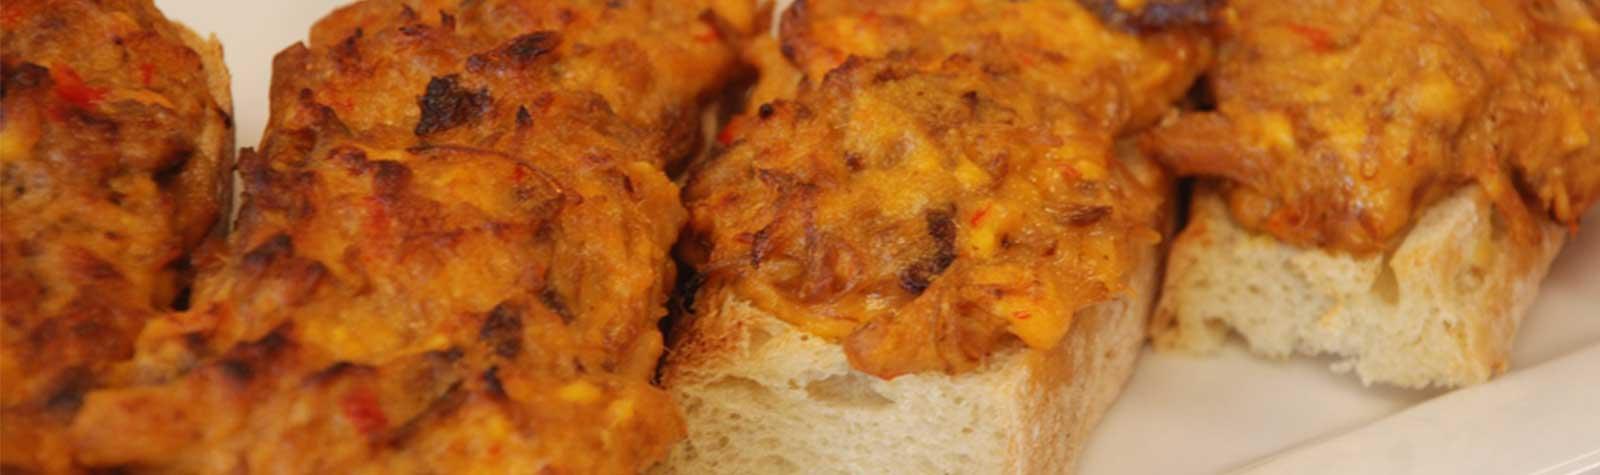 Pimento Cheese Bruschetta